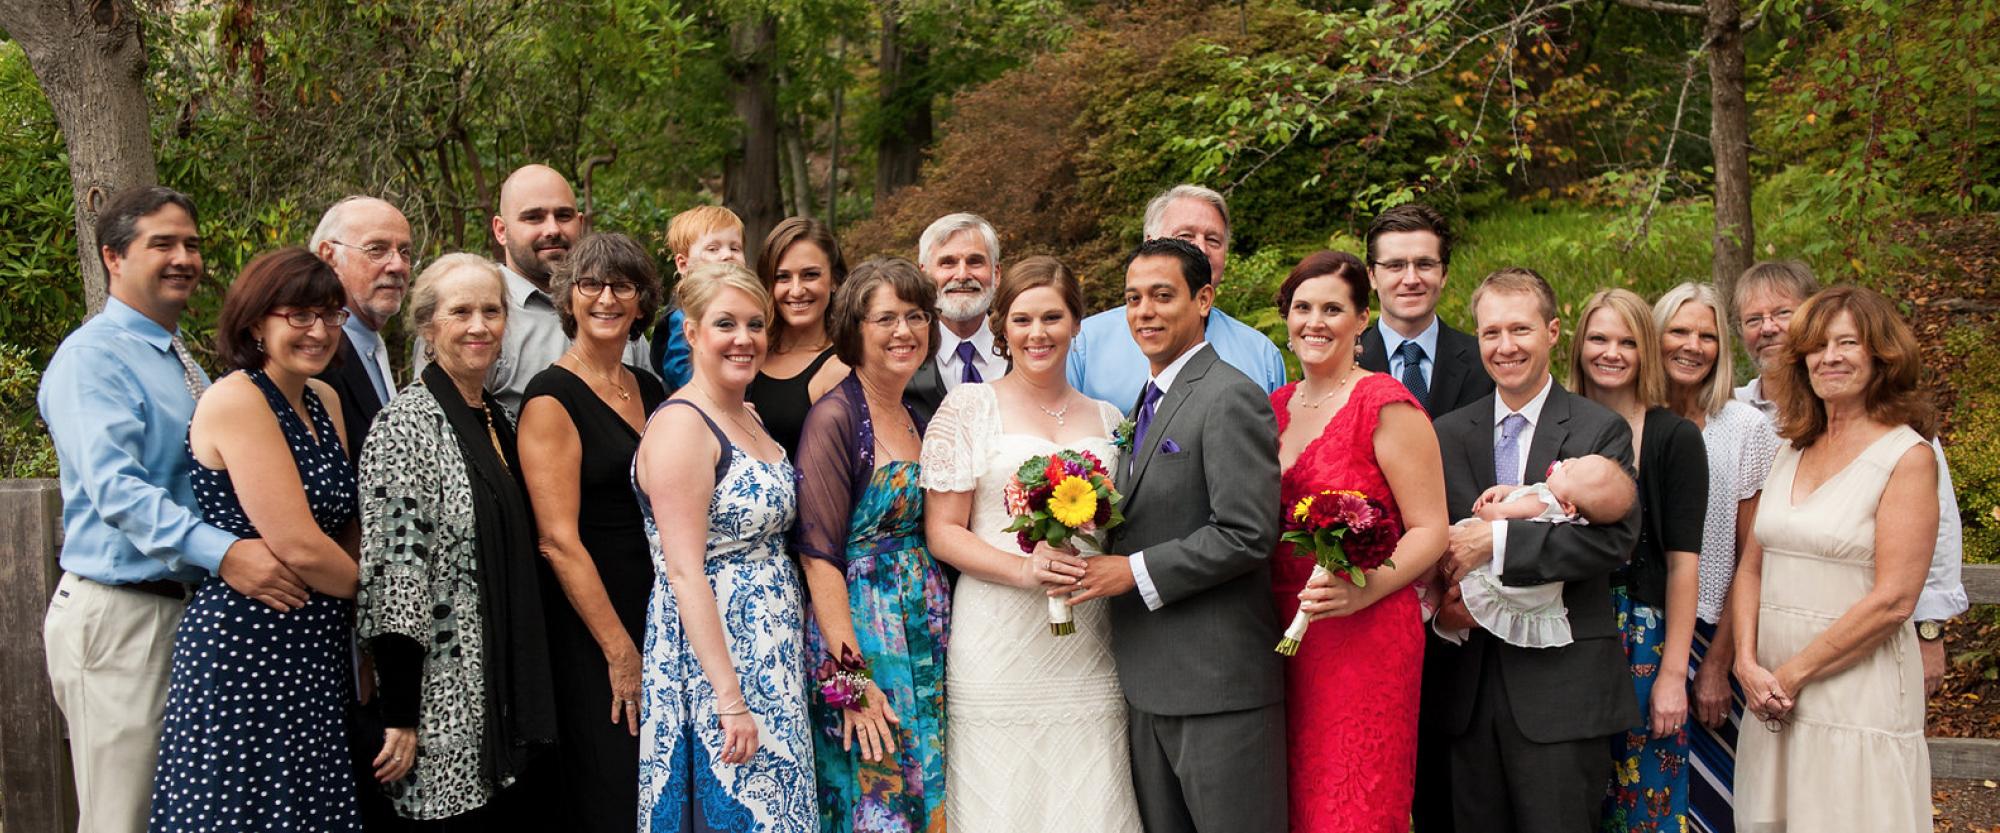 April 1, 2015 - 10:58am - AH_Weddings_rotator_slideshow2